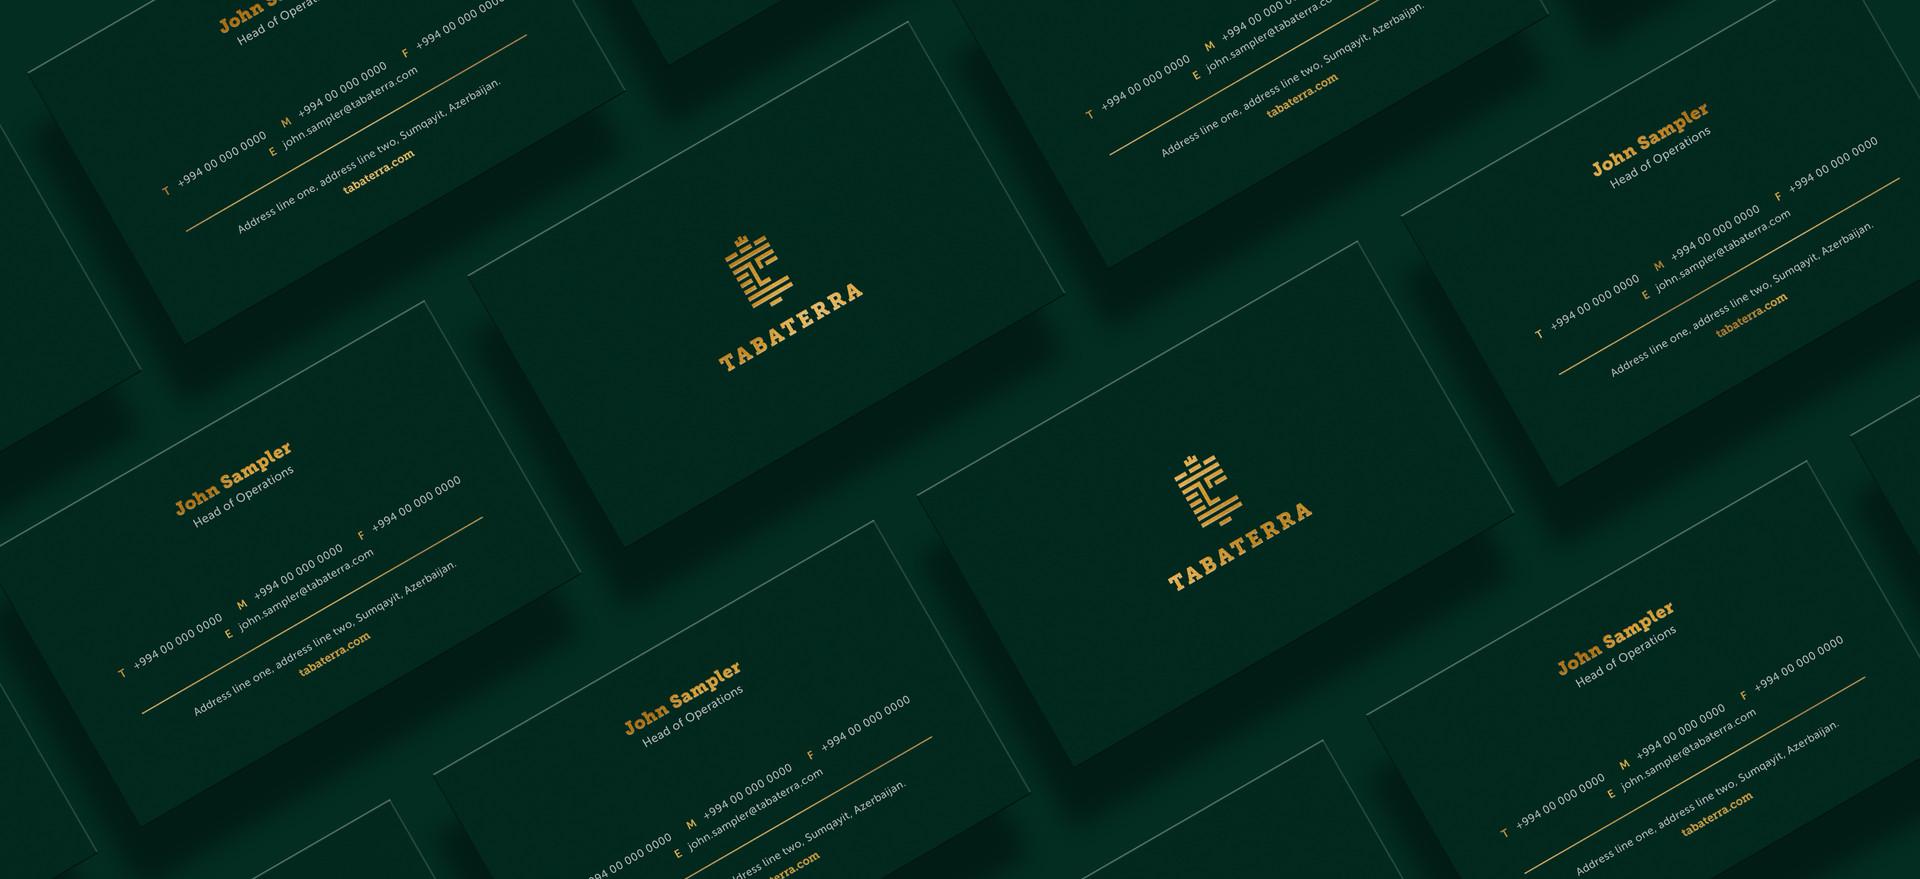 tll_tabaterra_Bus card design 2.jpg